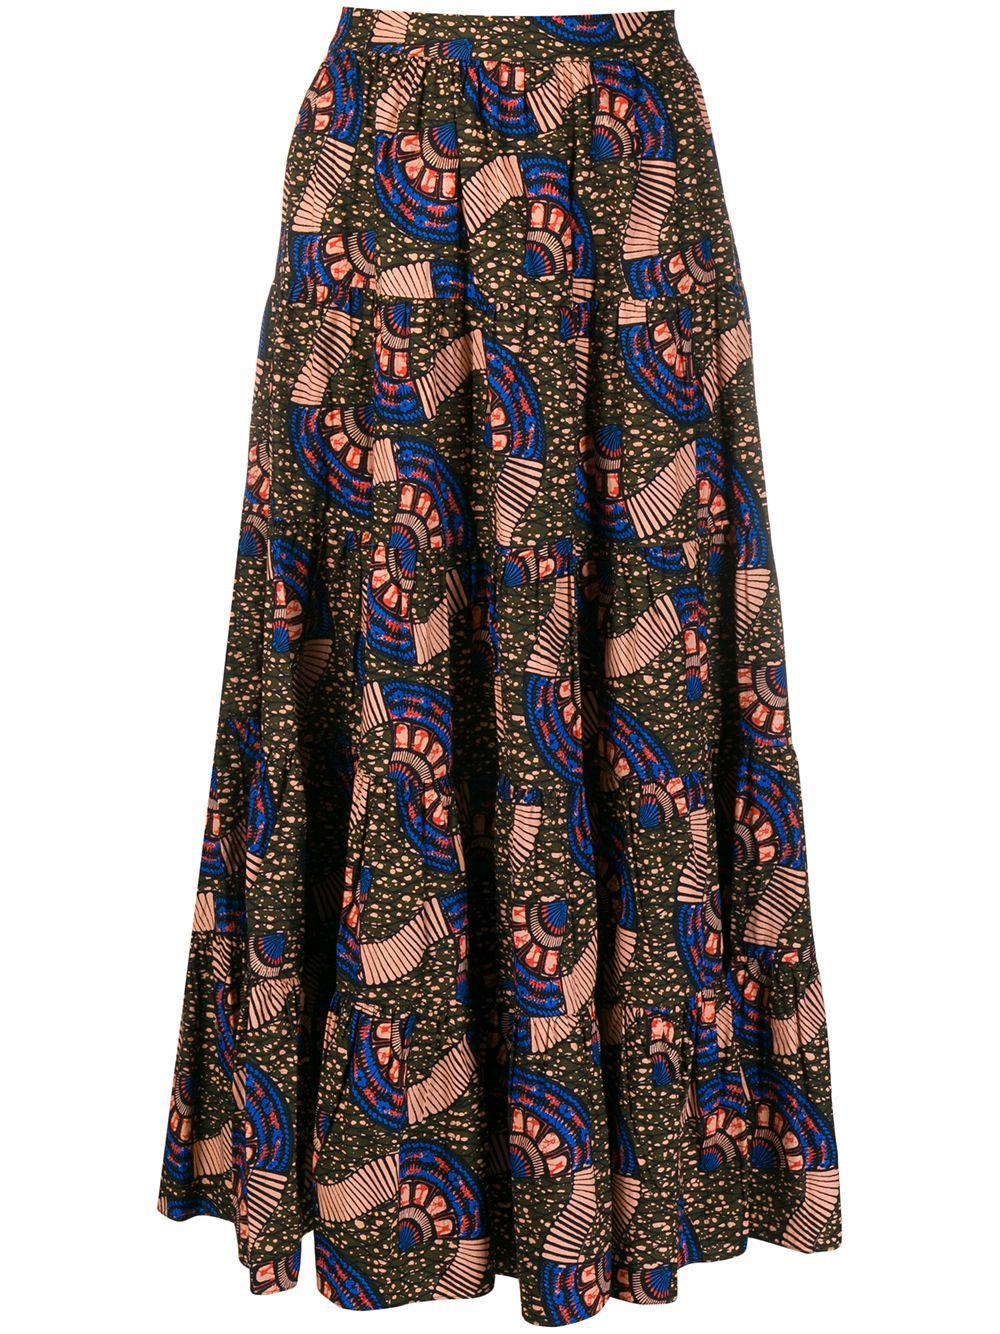 Sylvie Tiered Printed Skirt Item # SP200312